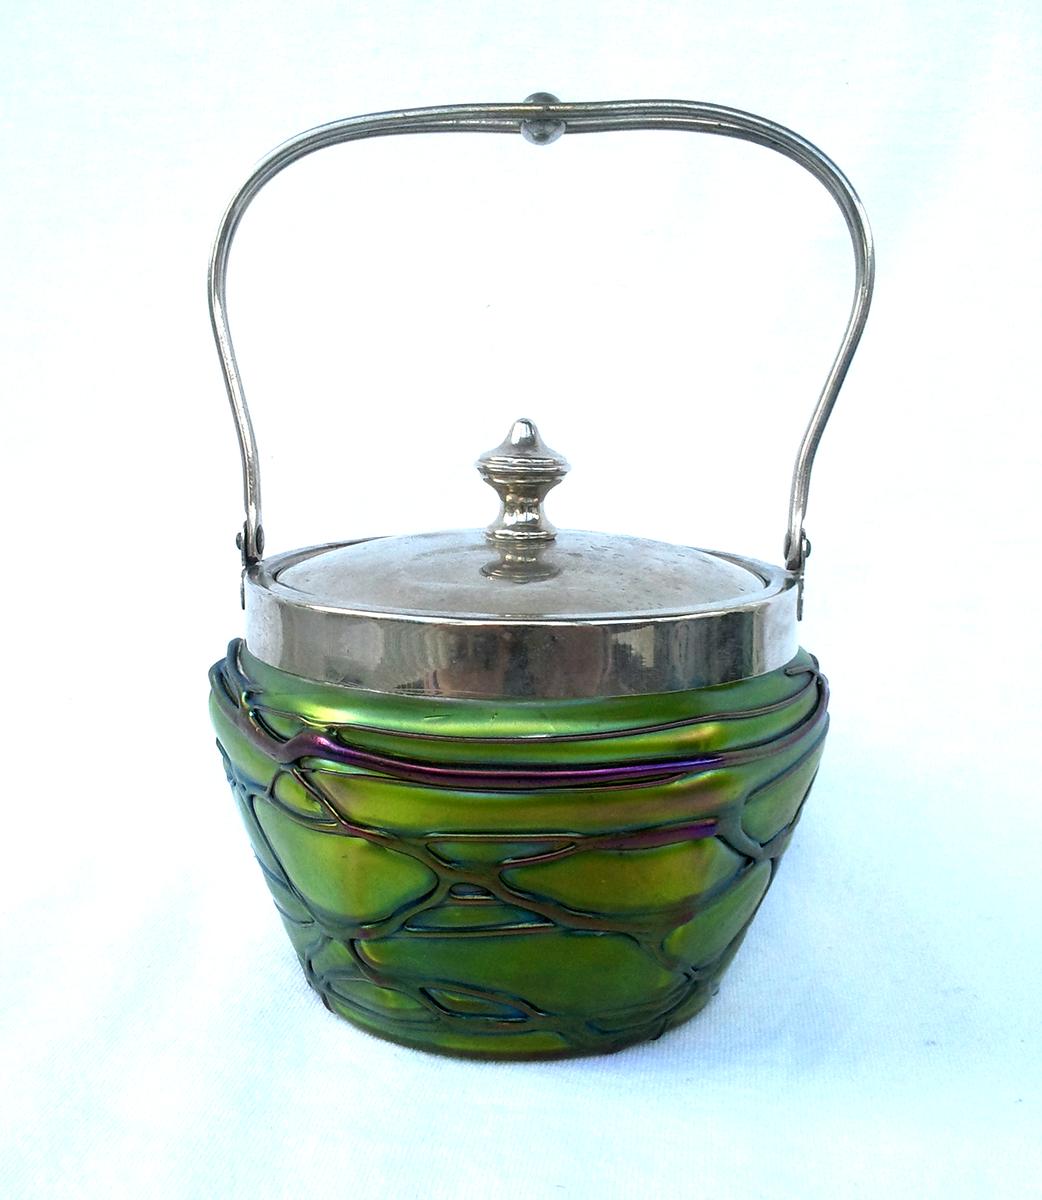 Iridescent #ArtGlass Biscuit Jar #Green with #Amethyst Threading #Pallme-Konig C.1900 https://t.co/RCZsoRw3Qj @ecrater #Glass #antique #artnouveau #vintageforsale #giftideas #bohemian #bohemia #SmallBiz #shopsmall #StandWithSmall #vintage #gotvintage #vintageshop #shopvintage https://t.co/Lzn5wSukqY